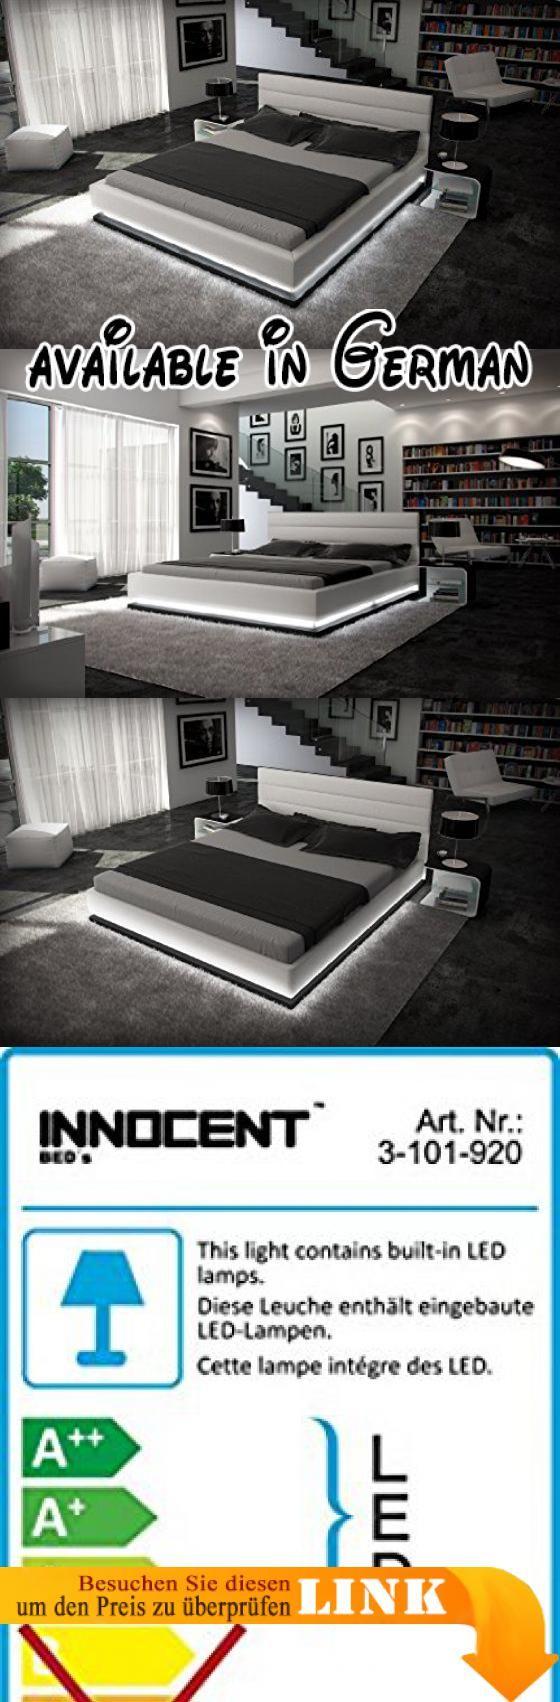 B00EOKITT6 : Doppelbett Kunstlederbett RIPANI 180 x 200 cm weiss ...